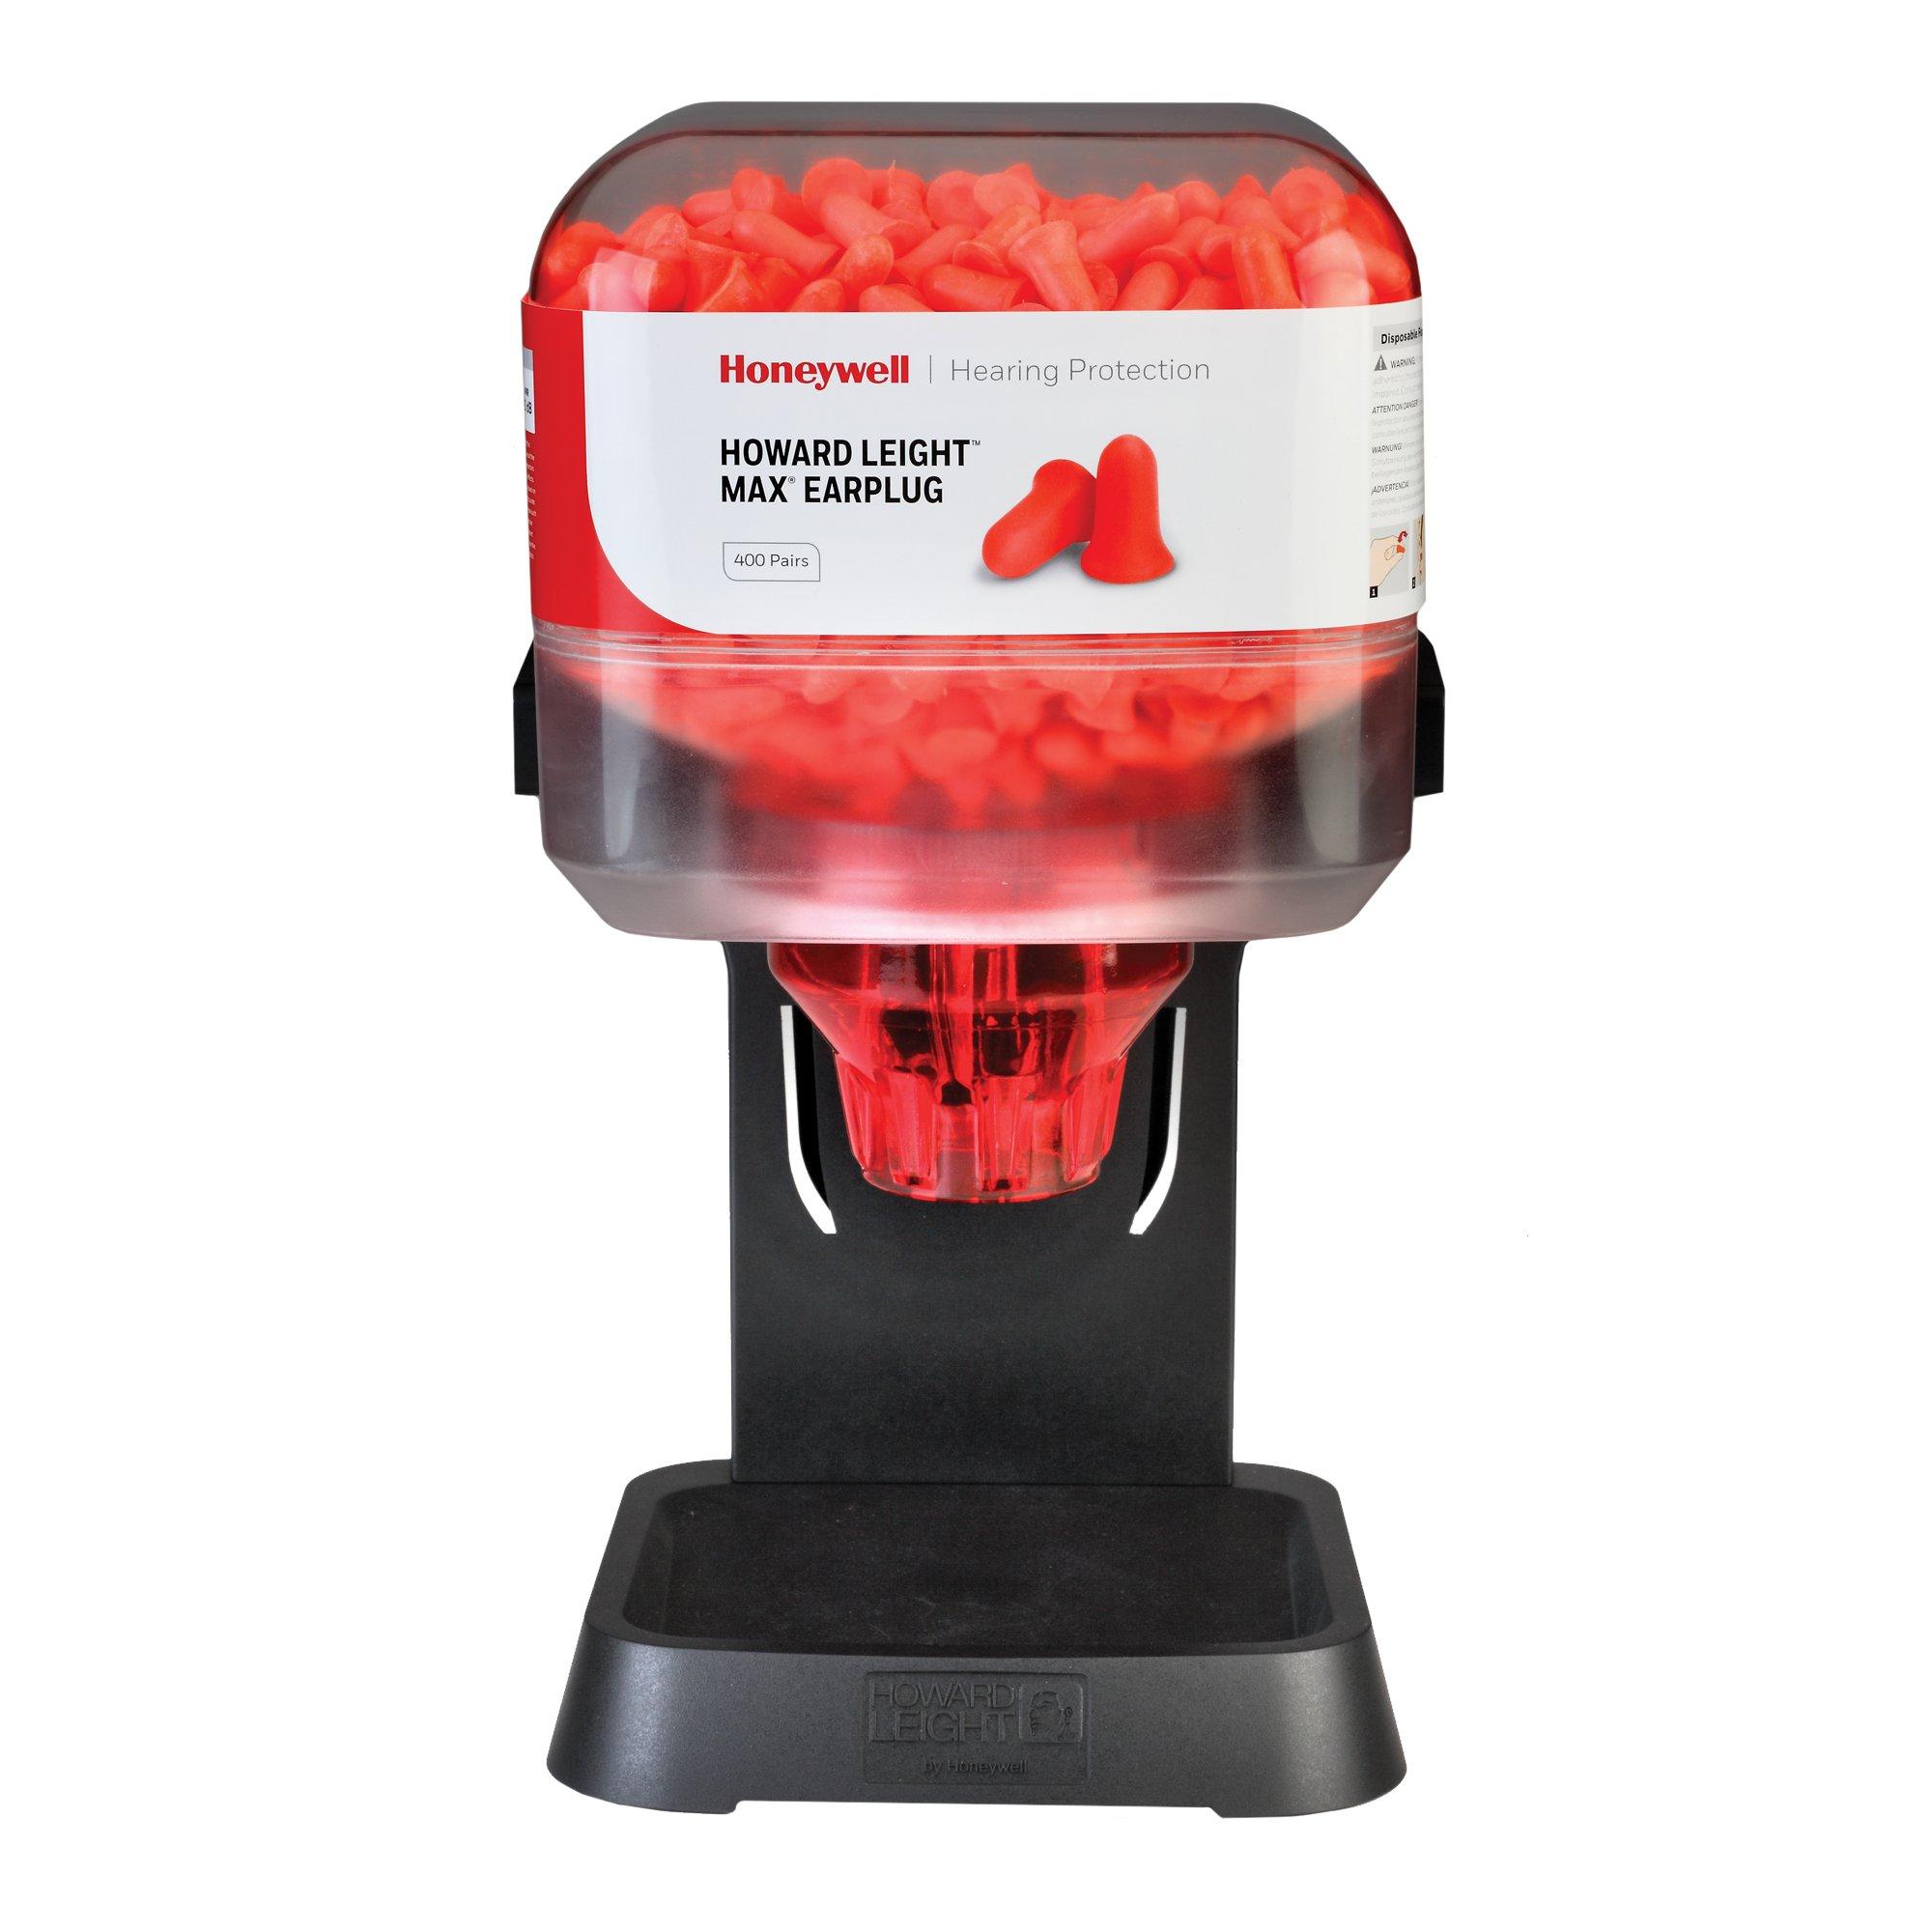 Howard Leight HL400 Earplug Dispenser with 400 Pairs of MAX Earplugs